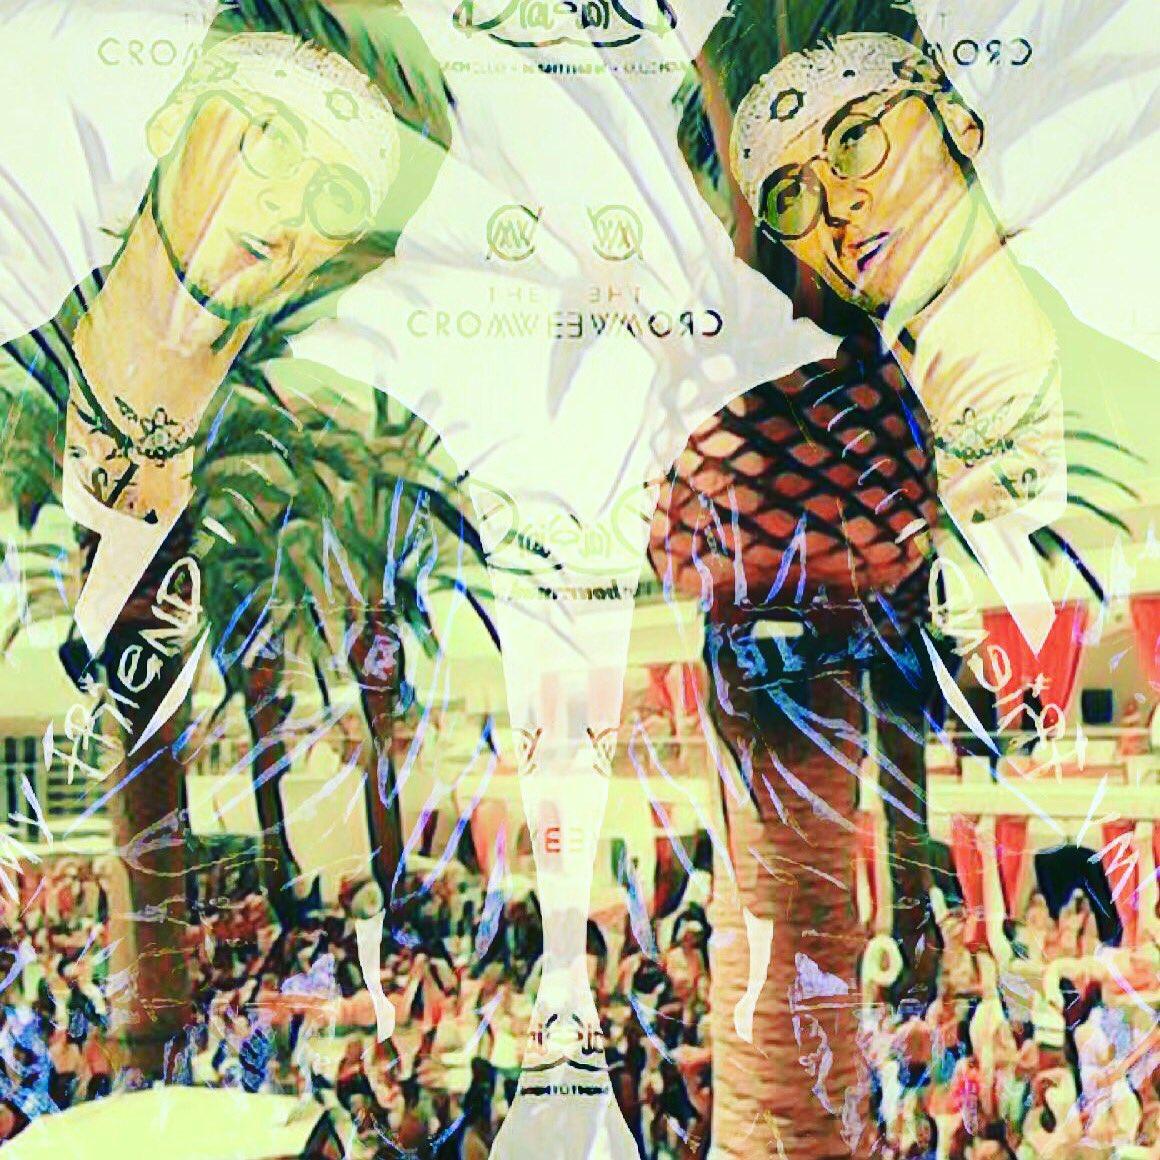 DOUBLE TROUBLE #MachineGunKelly #MGK #drais #LasVegas #DoubleTrouble #music @machinegunkelly<br>http://pic.twitter.com/r3FXSnl8JD